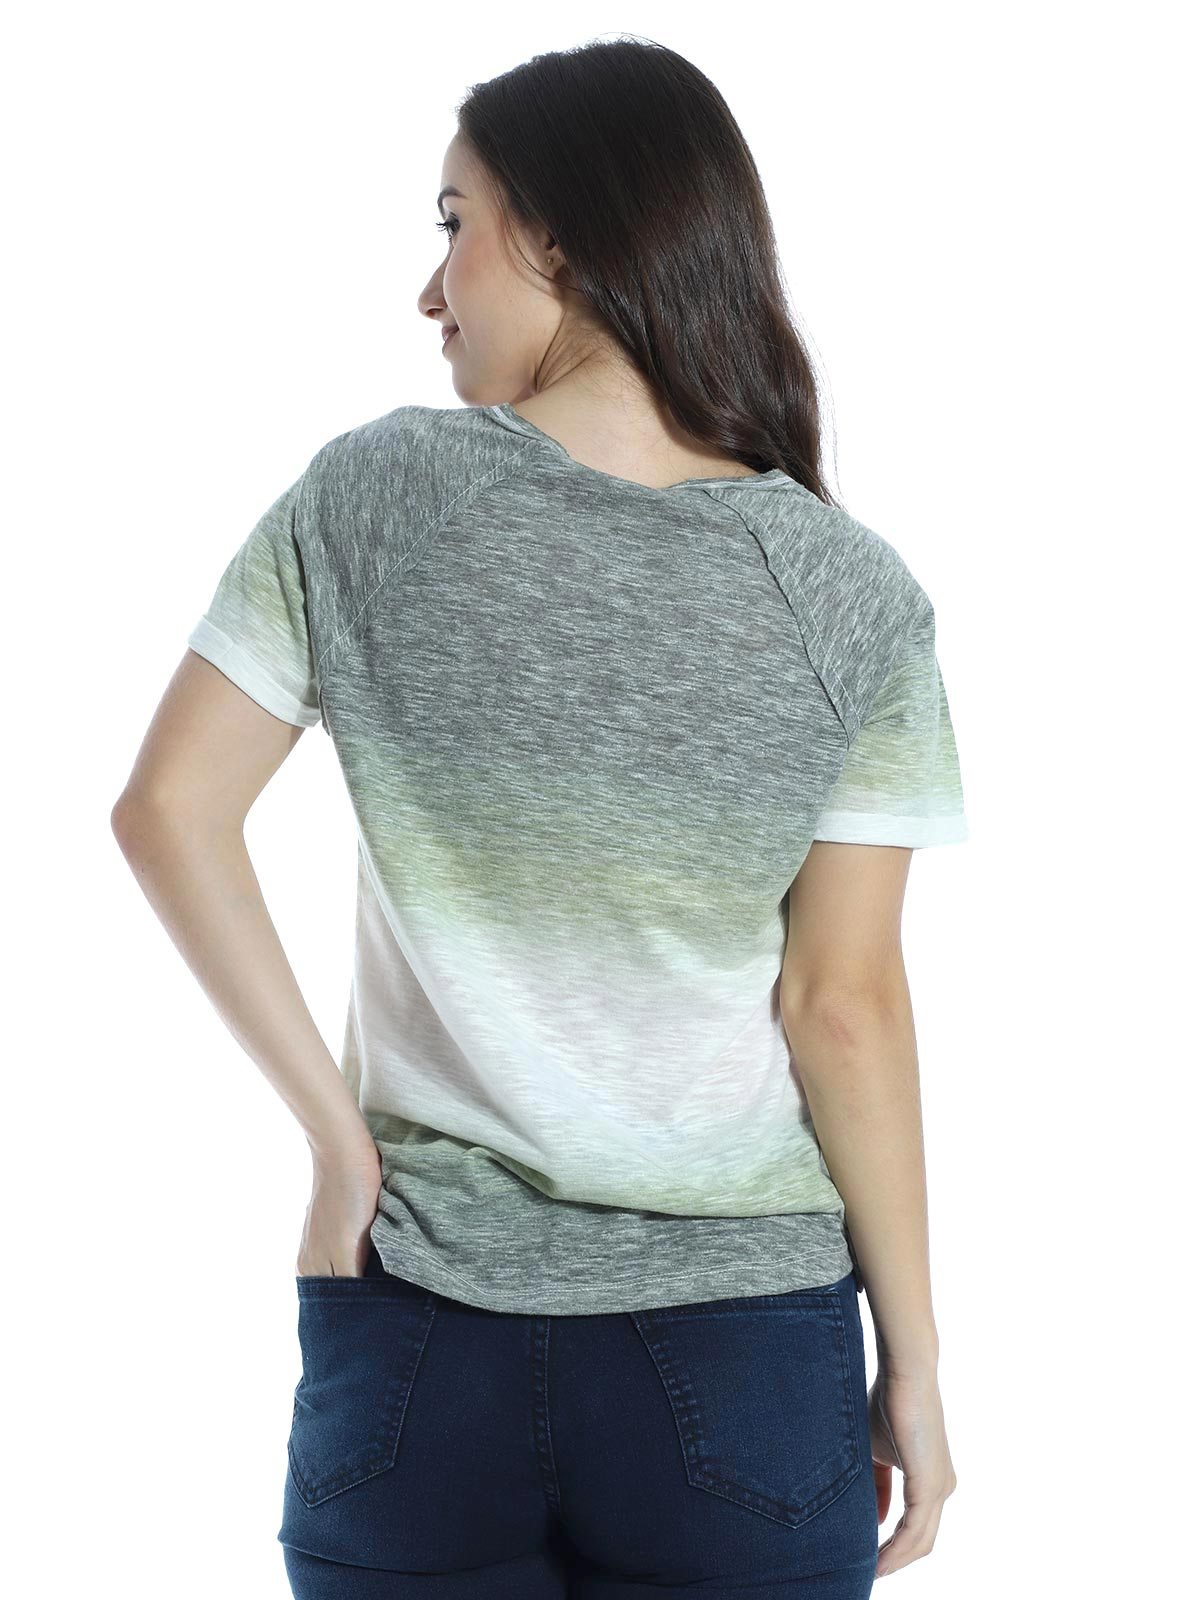 Blusa Longuete Devorê Decote V. Anistia Verde